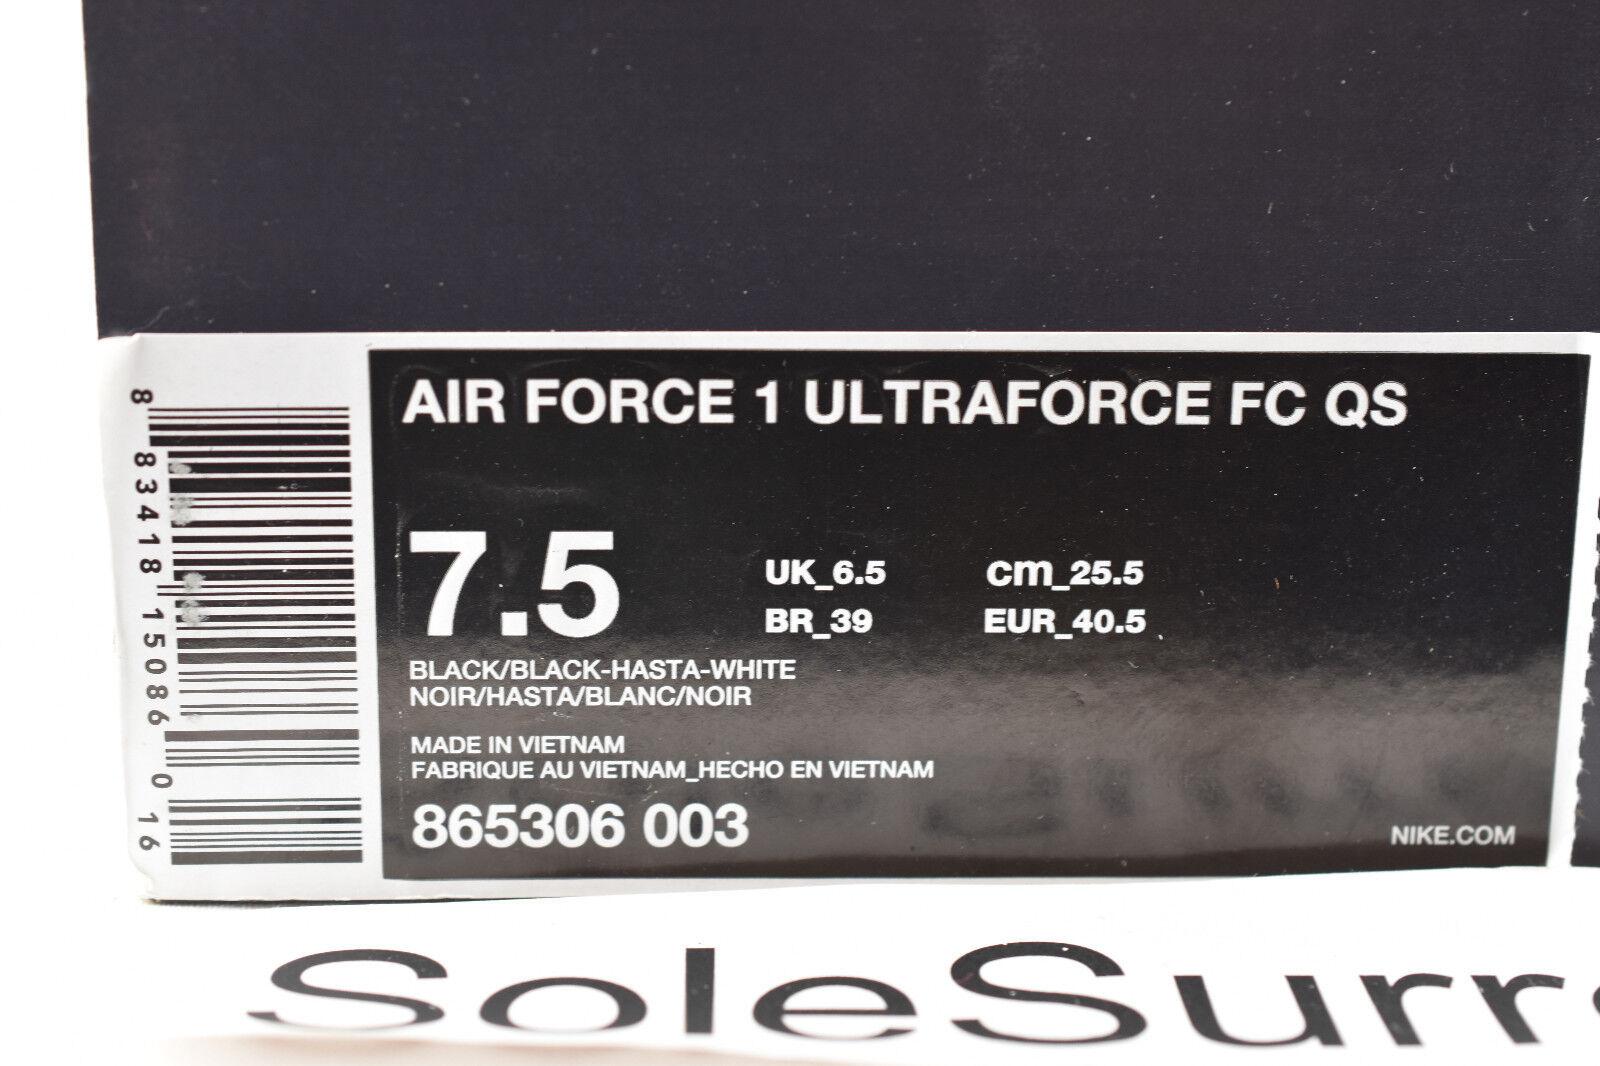 Nike Air Force 1 Ultraforce FC QS